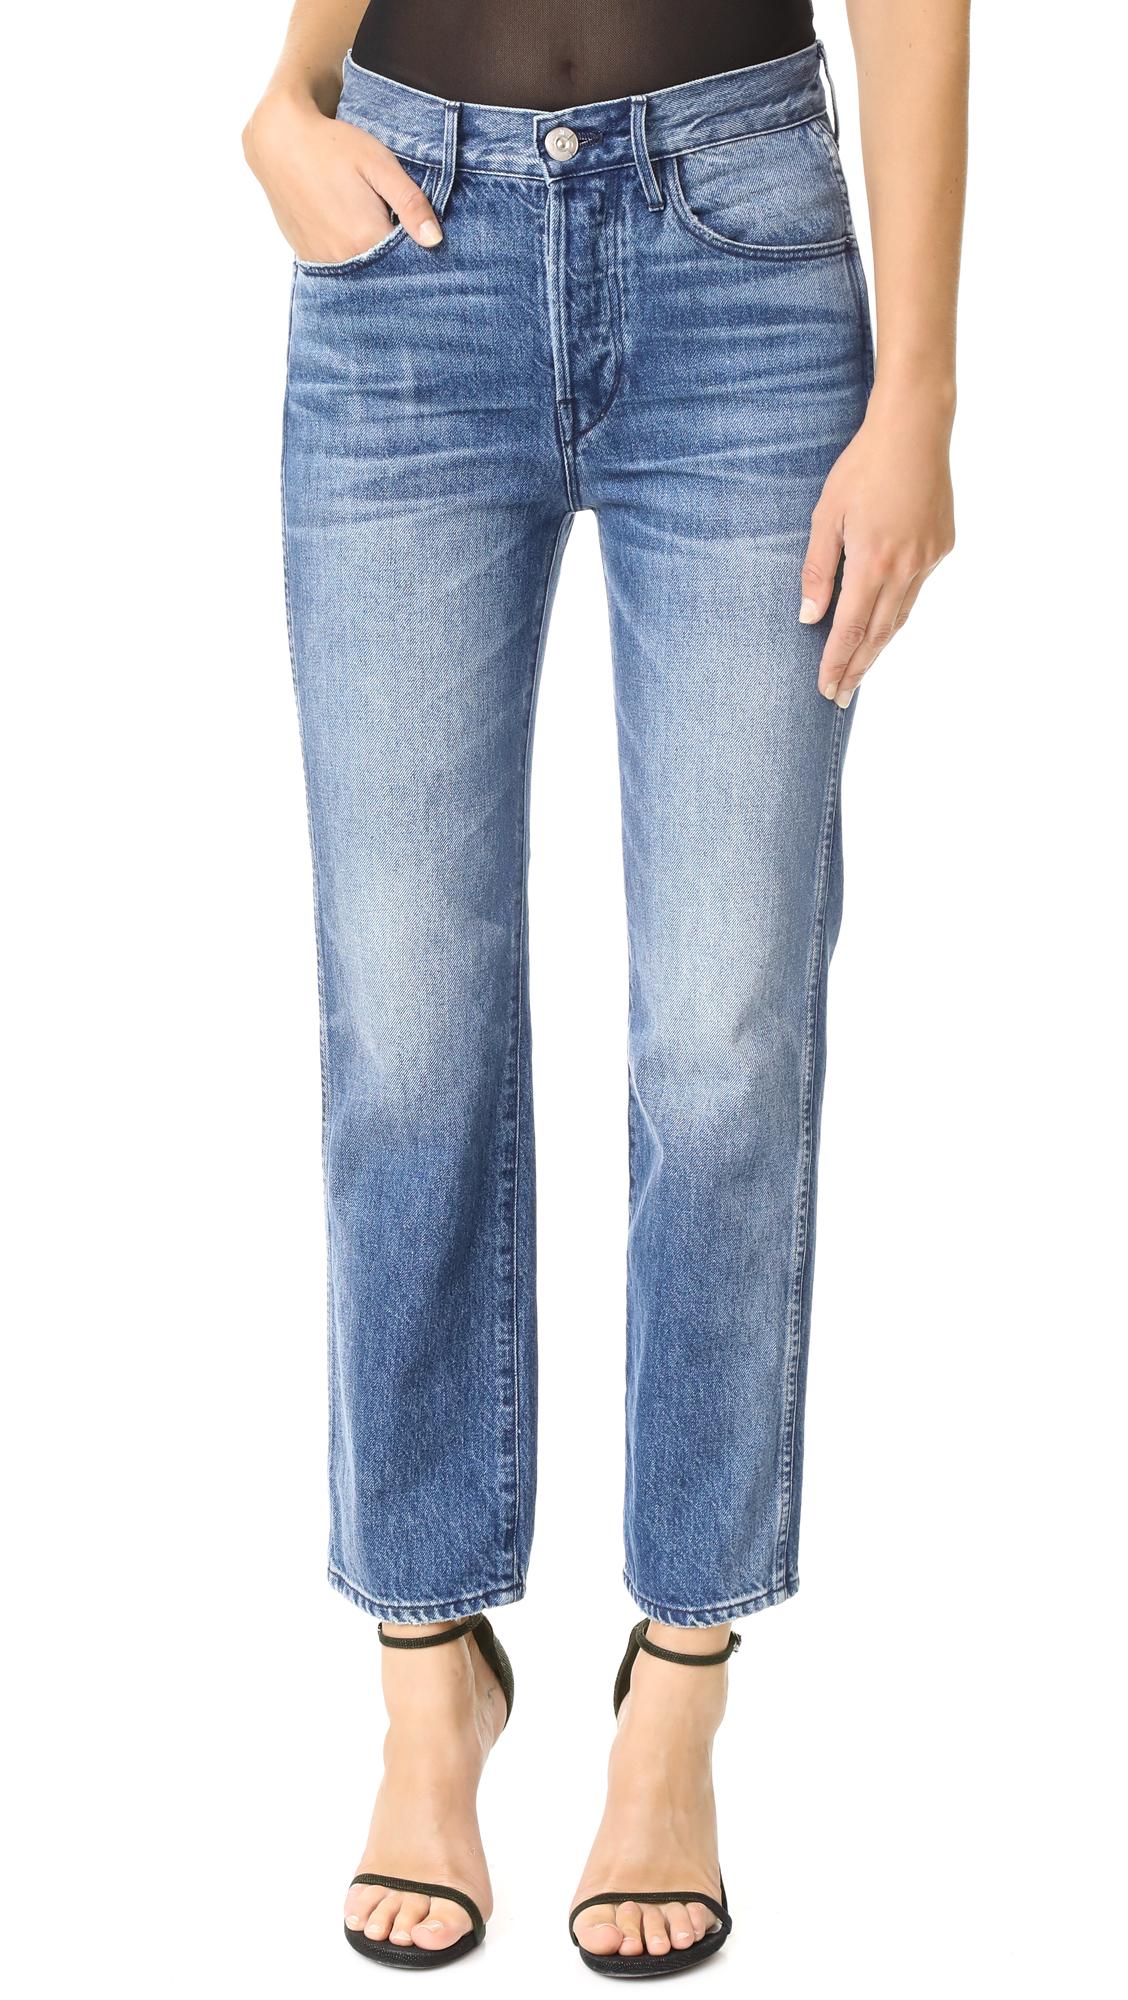 3x1 Shelter Austin Crop Jeans - Malone